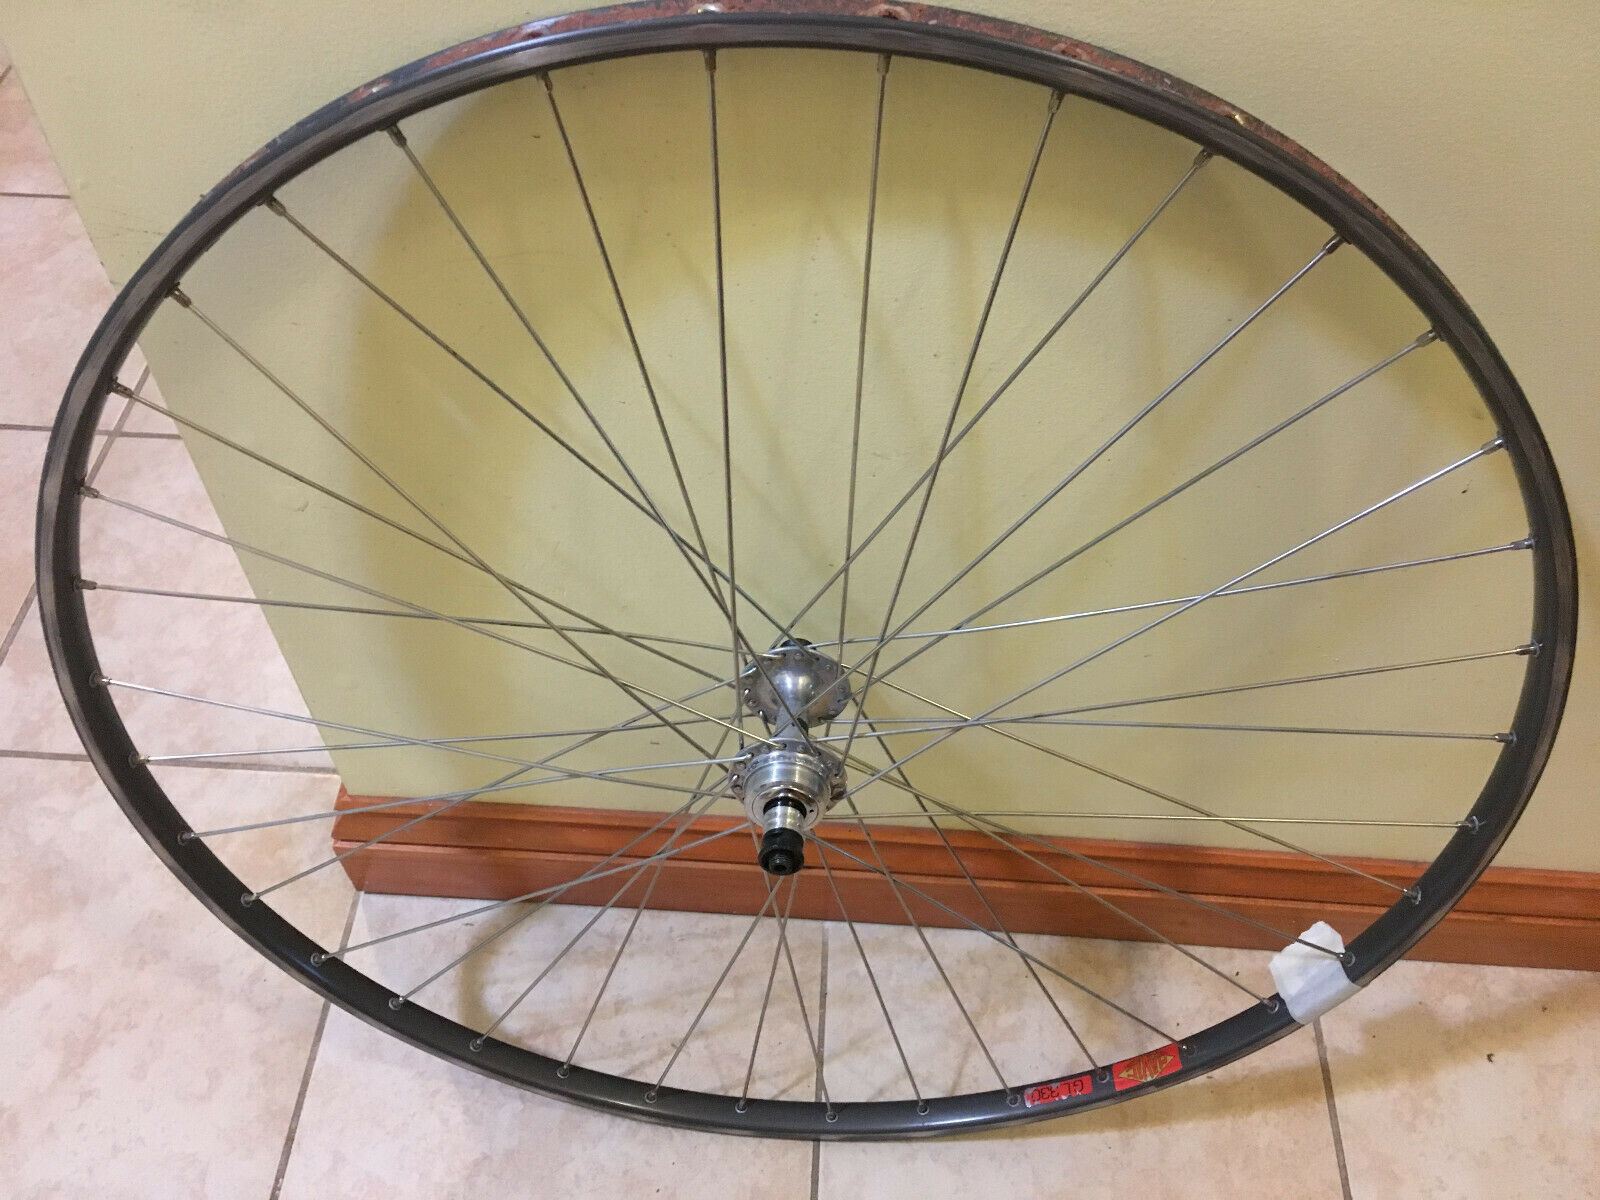 Campagnolo Record Rear Mavic GEL 330 Tubular Wheel  36 hole 126 Hub Spacing  hot sale